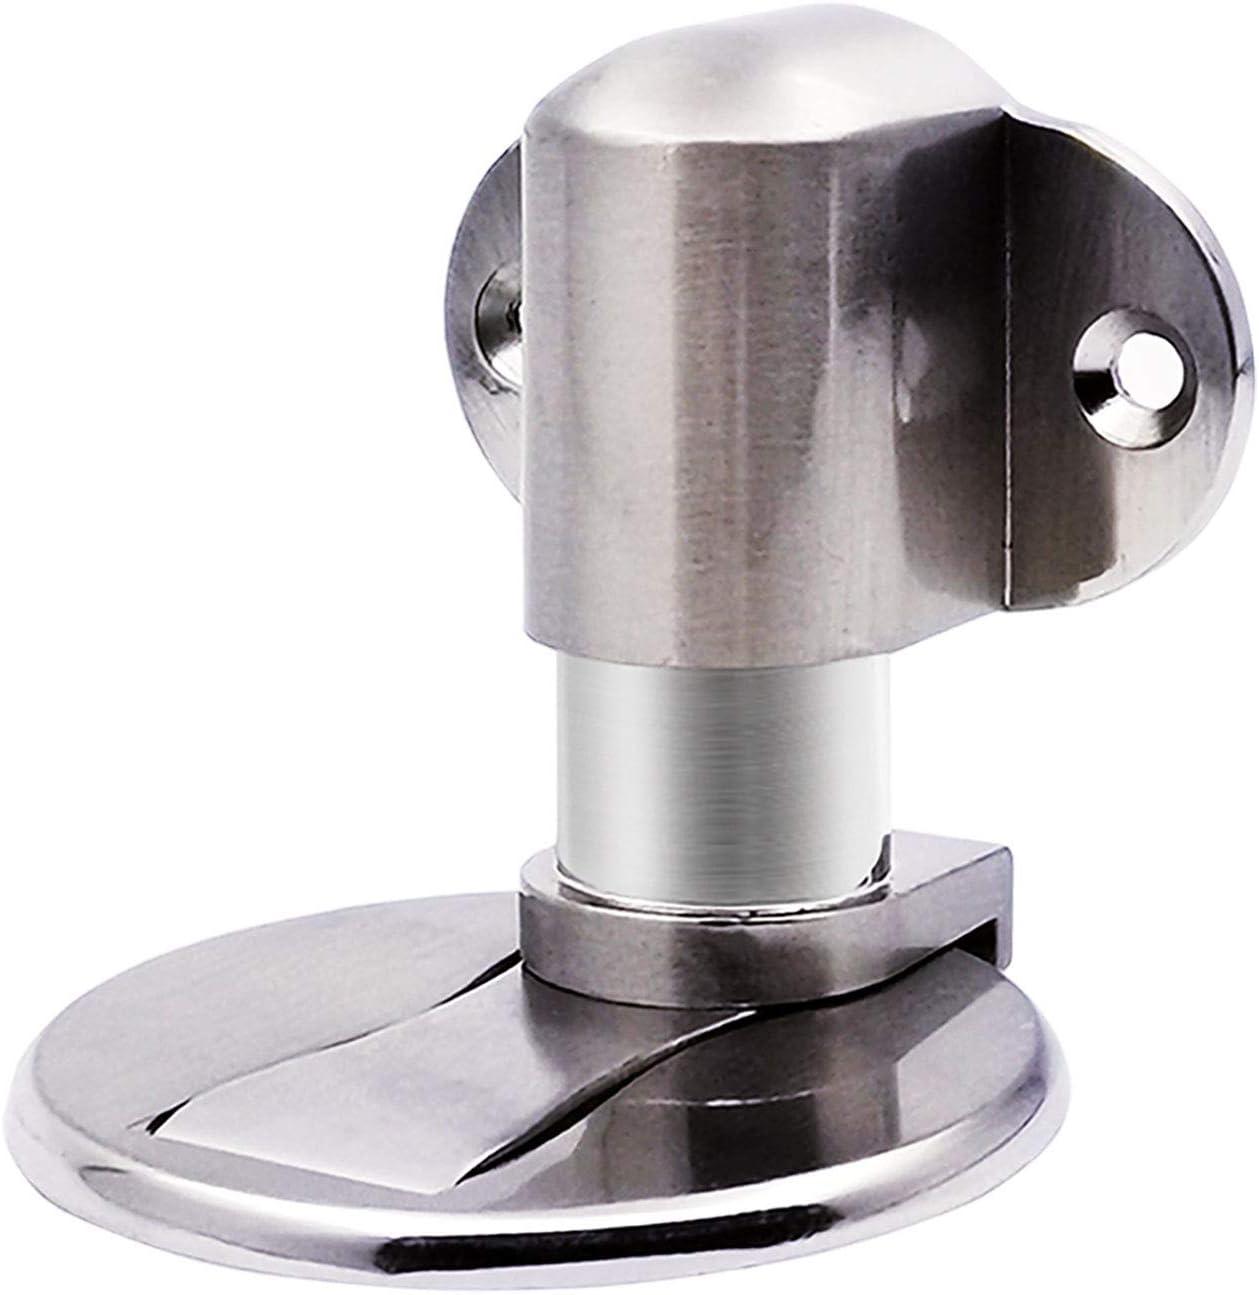 Discount is also underway Stainless Steel Magnetic Door Holder Catch Kansas City Mall Height-Adjustab Stop